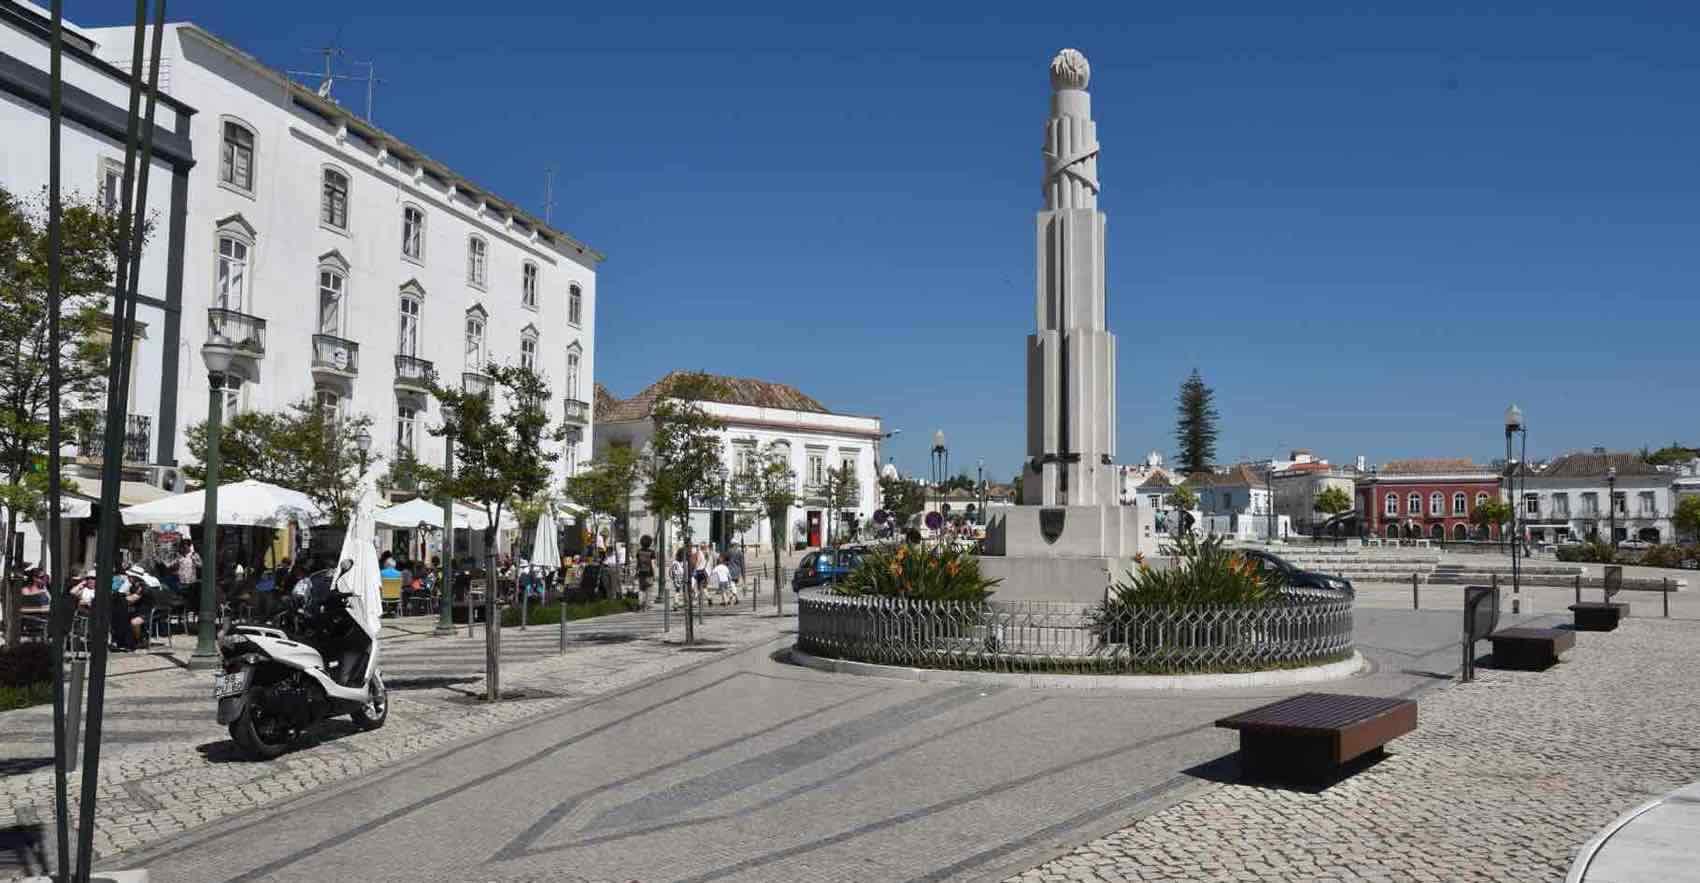 The City centre of Tavira town, Algarve, Portugal